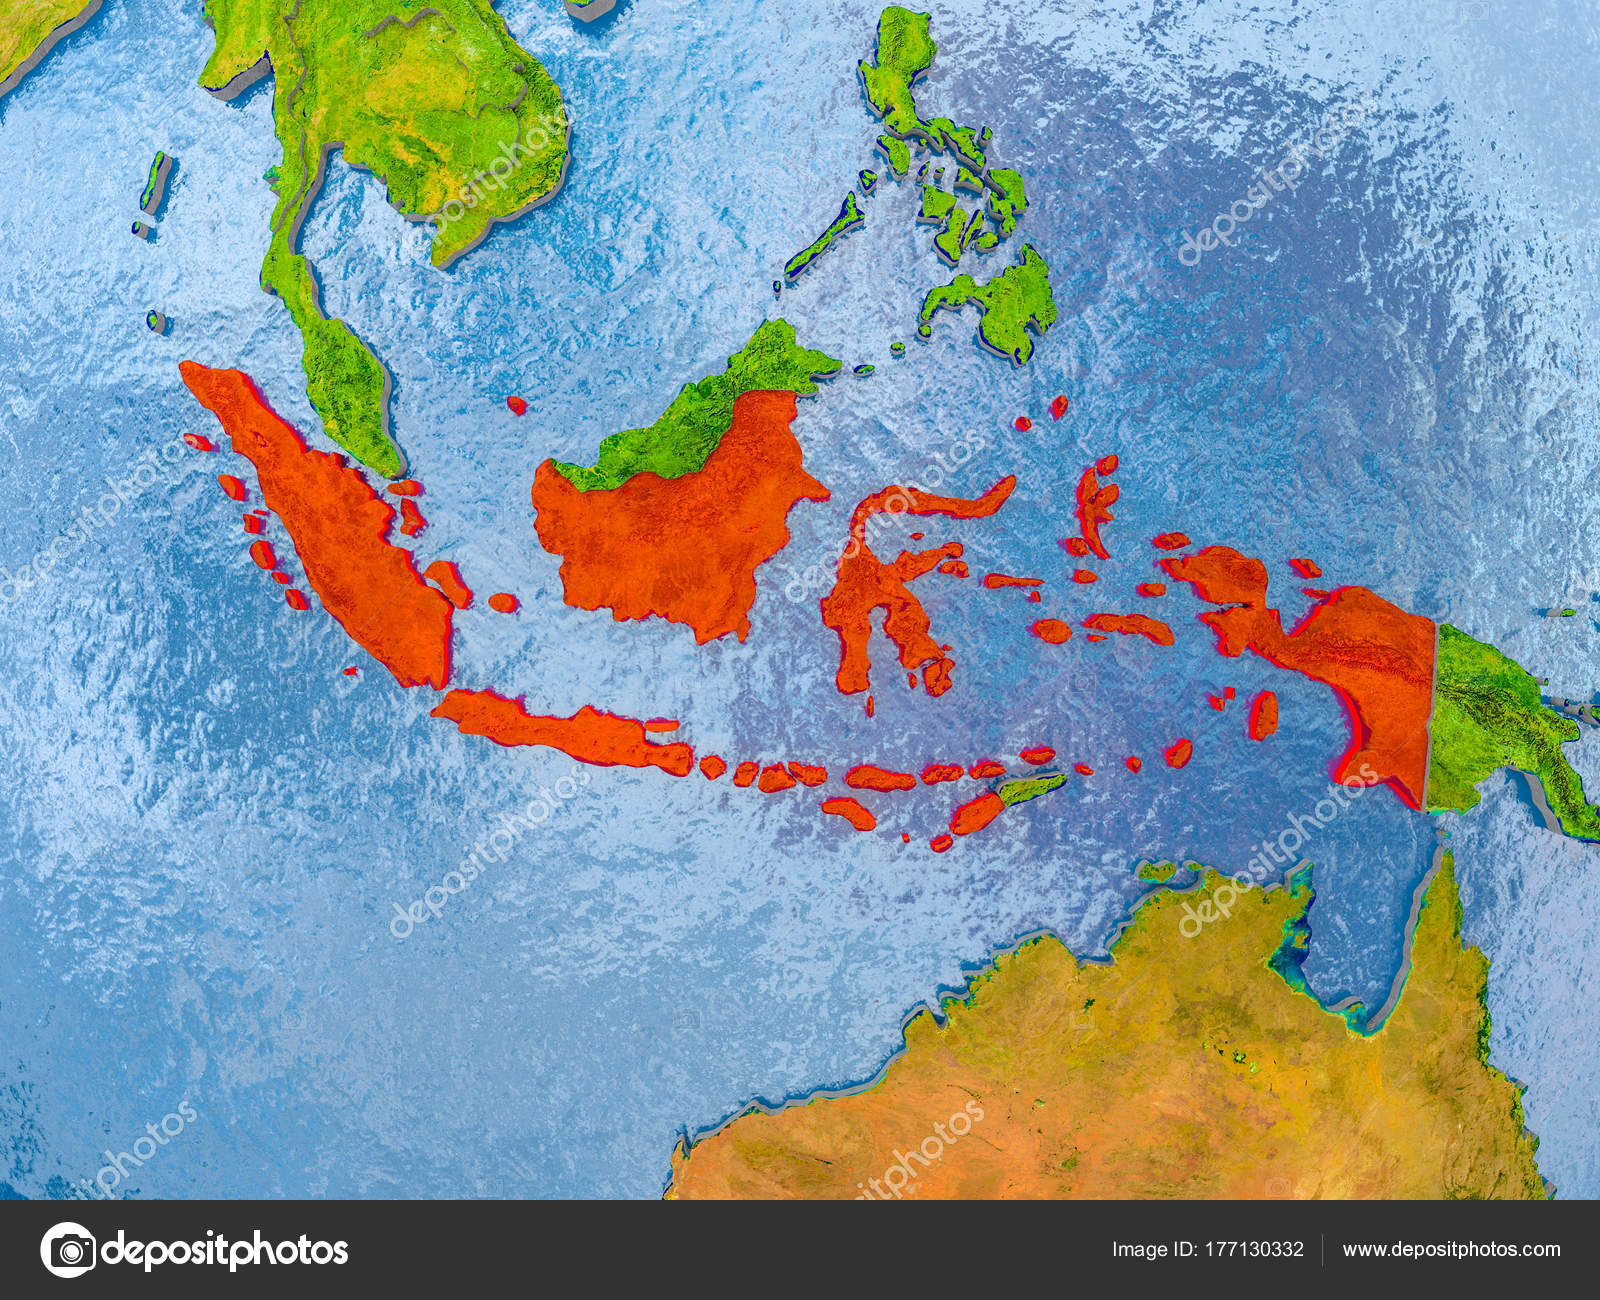 Indonesien Karte.Karte Von Indonesien Stockfoto C Tom Griger 177130332